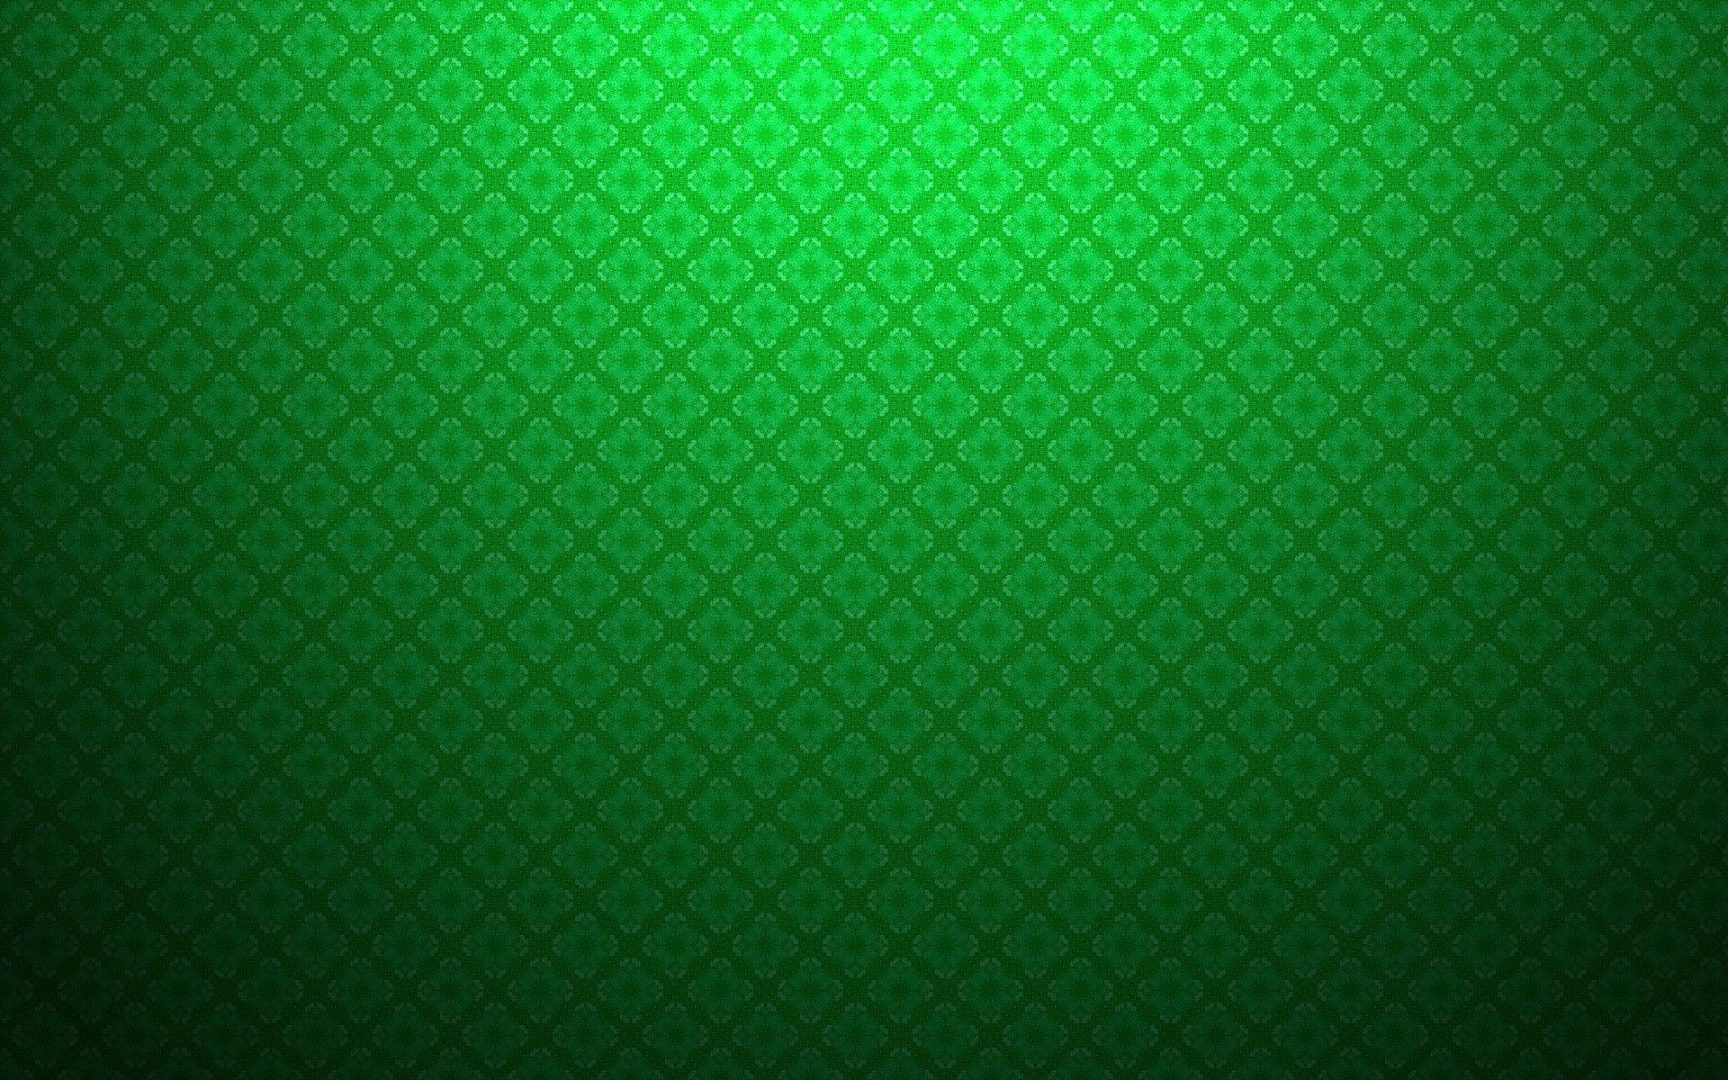 green photo 6089 - hdwpro, Powerpoint templates